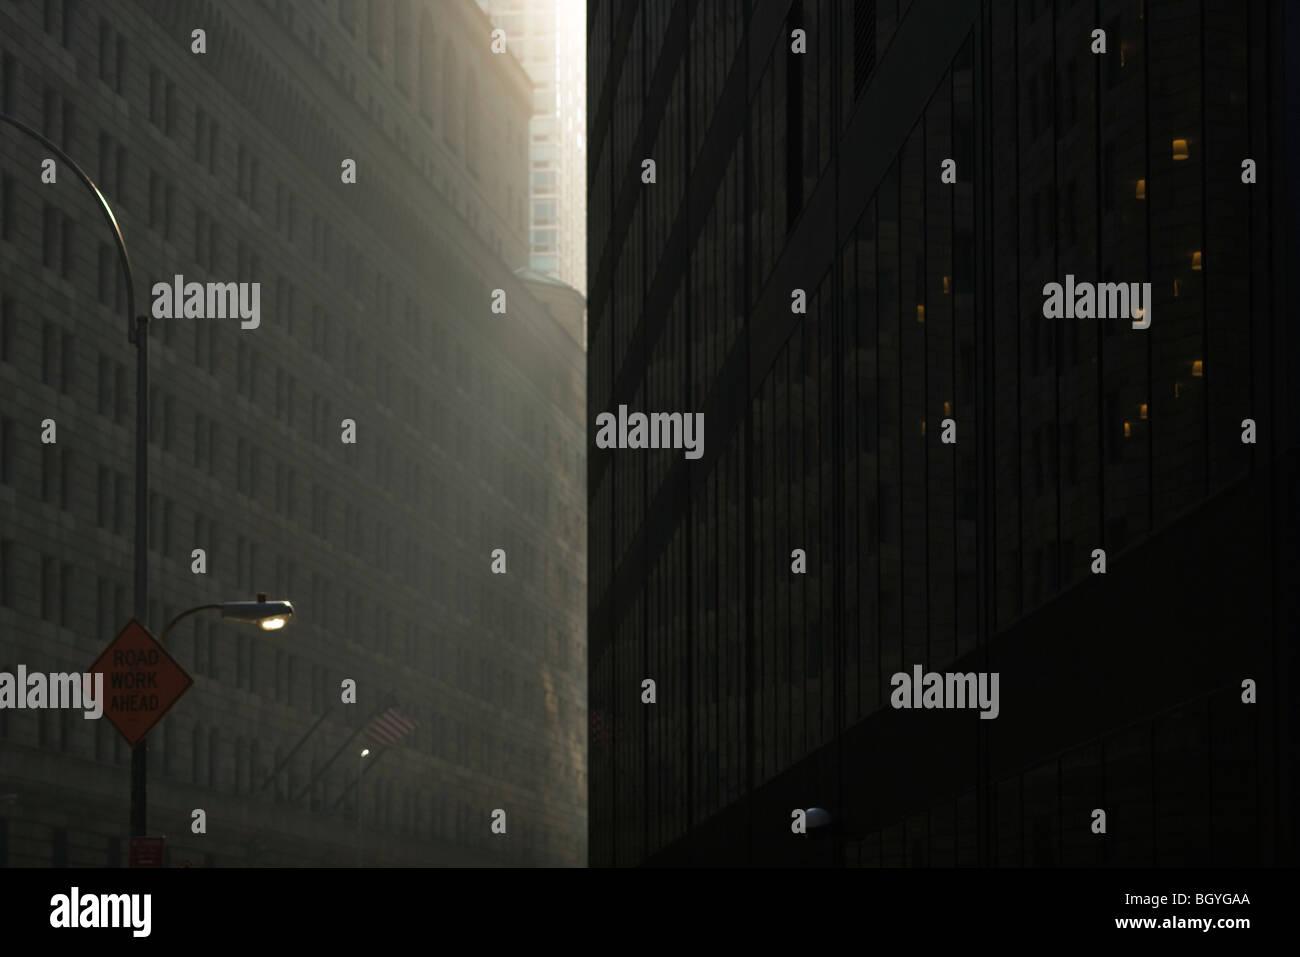 Early morning sunlight illuminating dark city streets hidden between towering high rises, NYC, NY - Stock Image